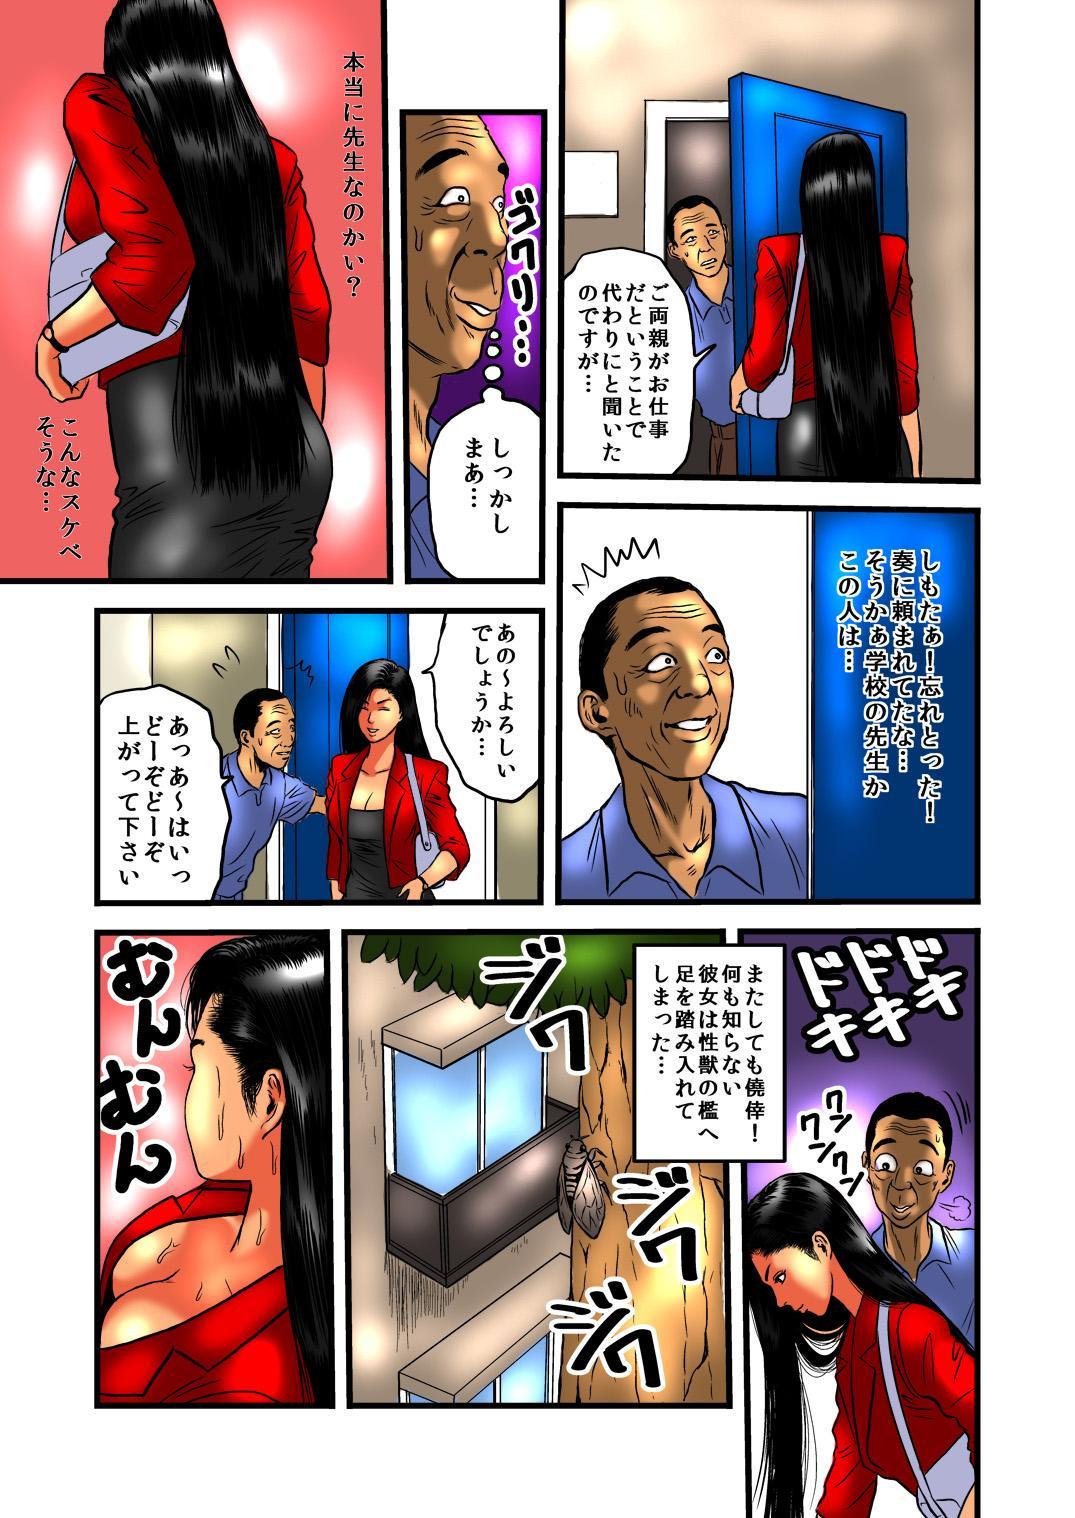 Ryoujoku no Katei Houmon ・ Zenpen 4